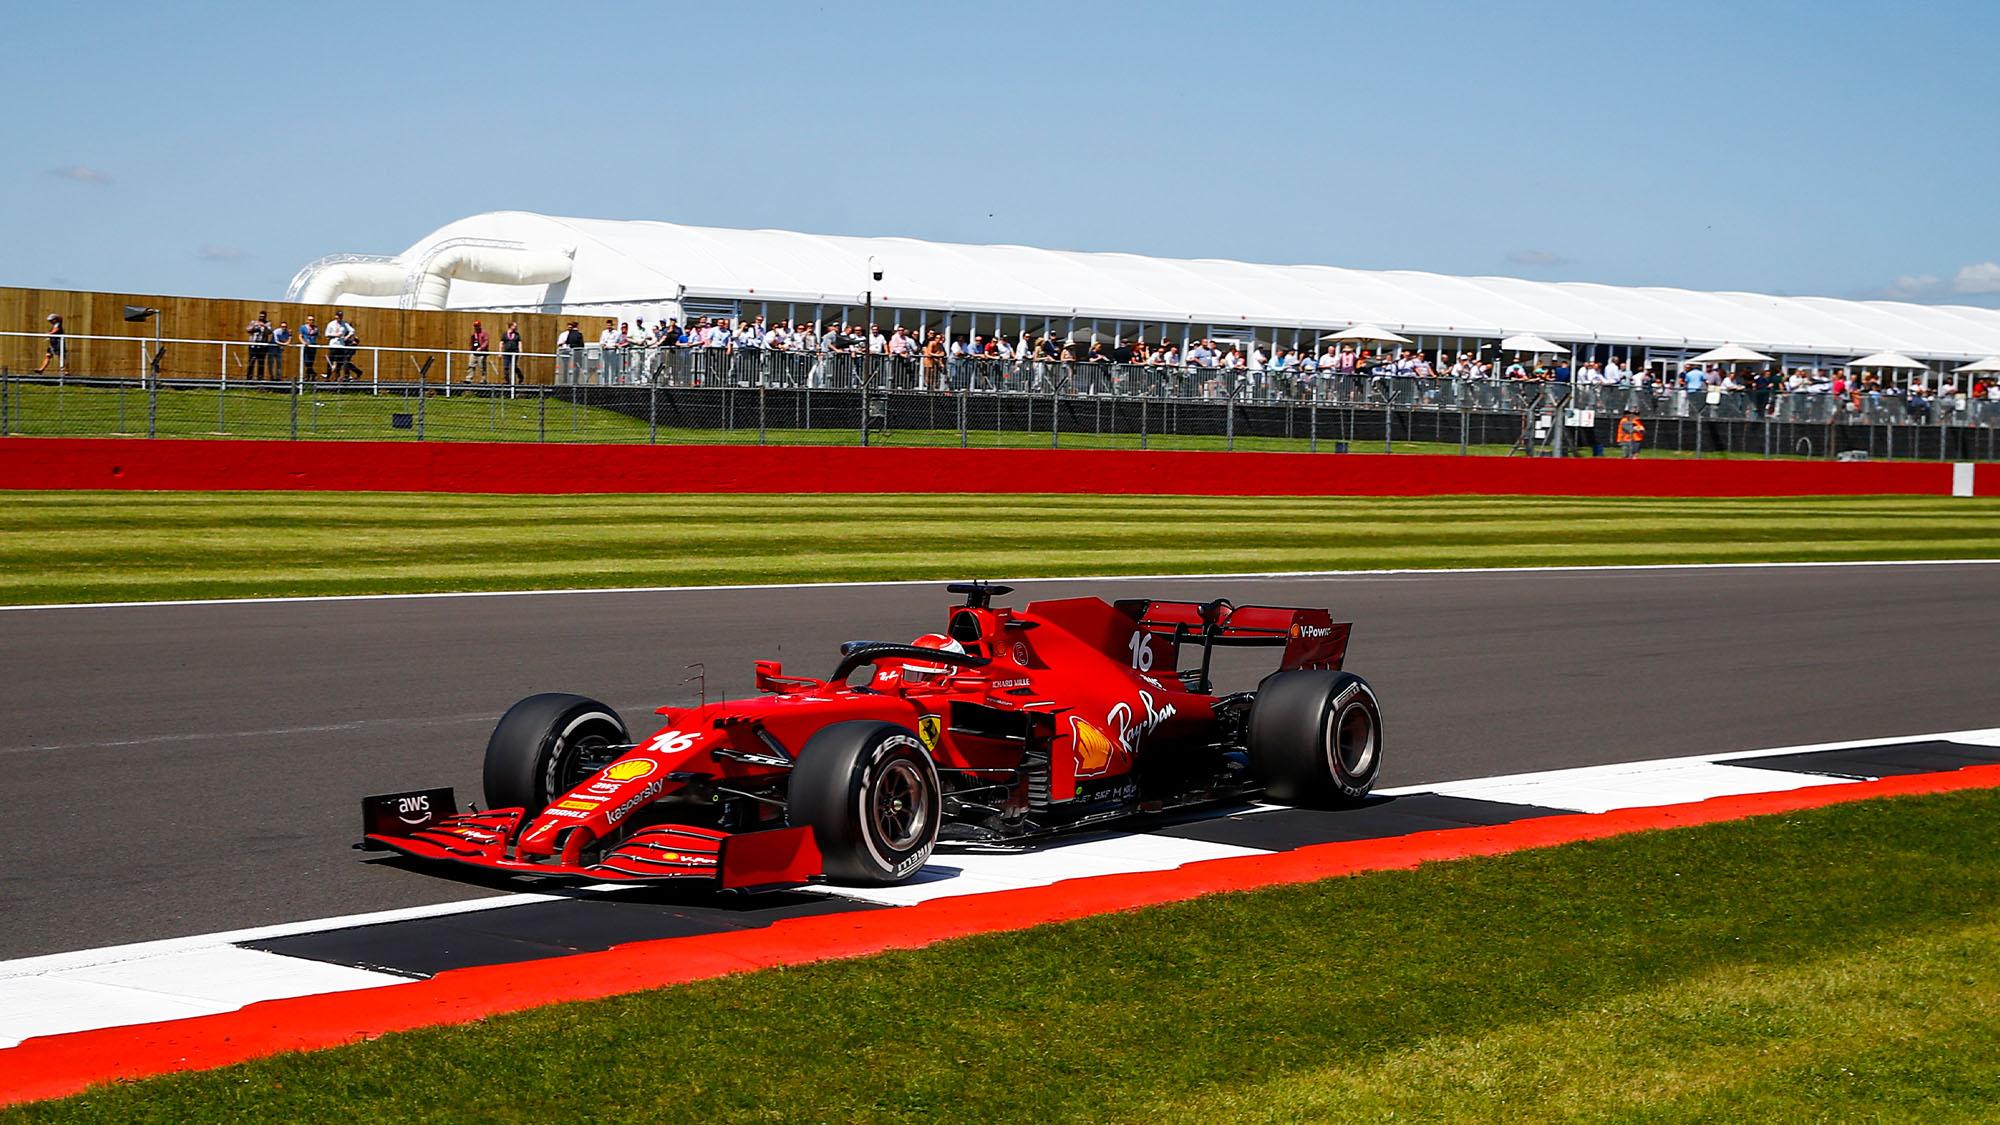 16 LECLERC Charles (mco), Scuderia Ferrari SF21, action during the Formula 1 Pirelli British Grand Prix 2021, 10th round of the 2021 FIA Formula One World Championship from July 16 to 18, 2021 on the Silverstone Circuit, in Silverstone, United Kingdom - Photo Xavi Bonilla / DPPI